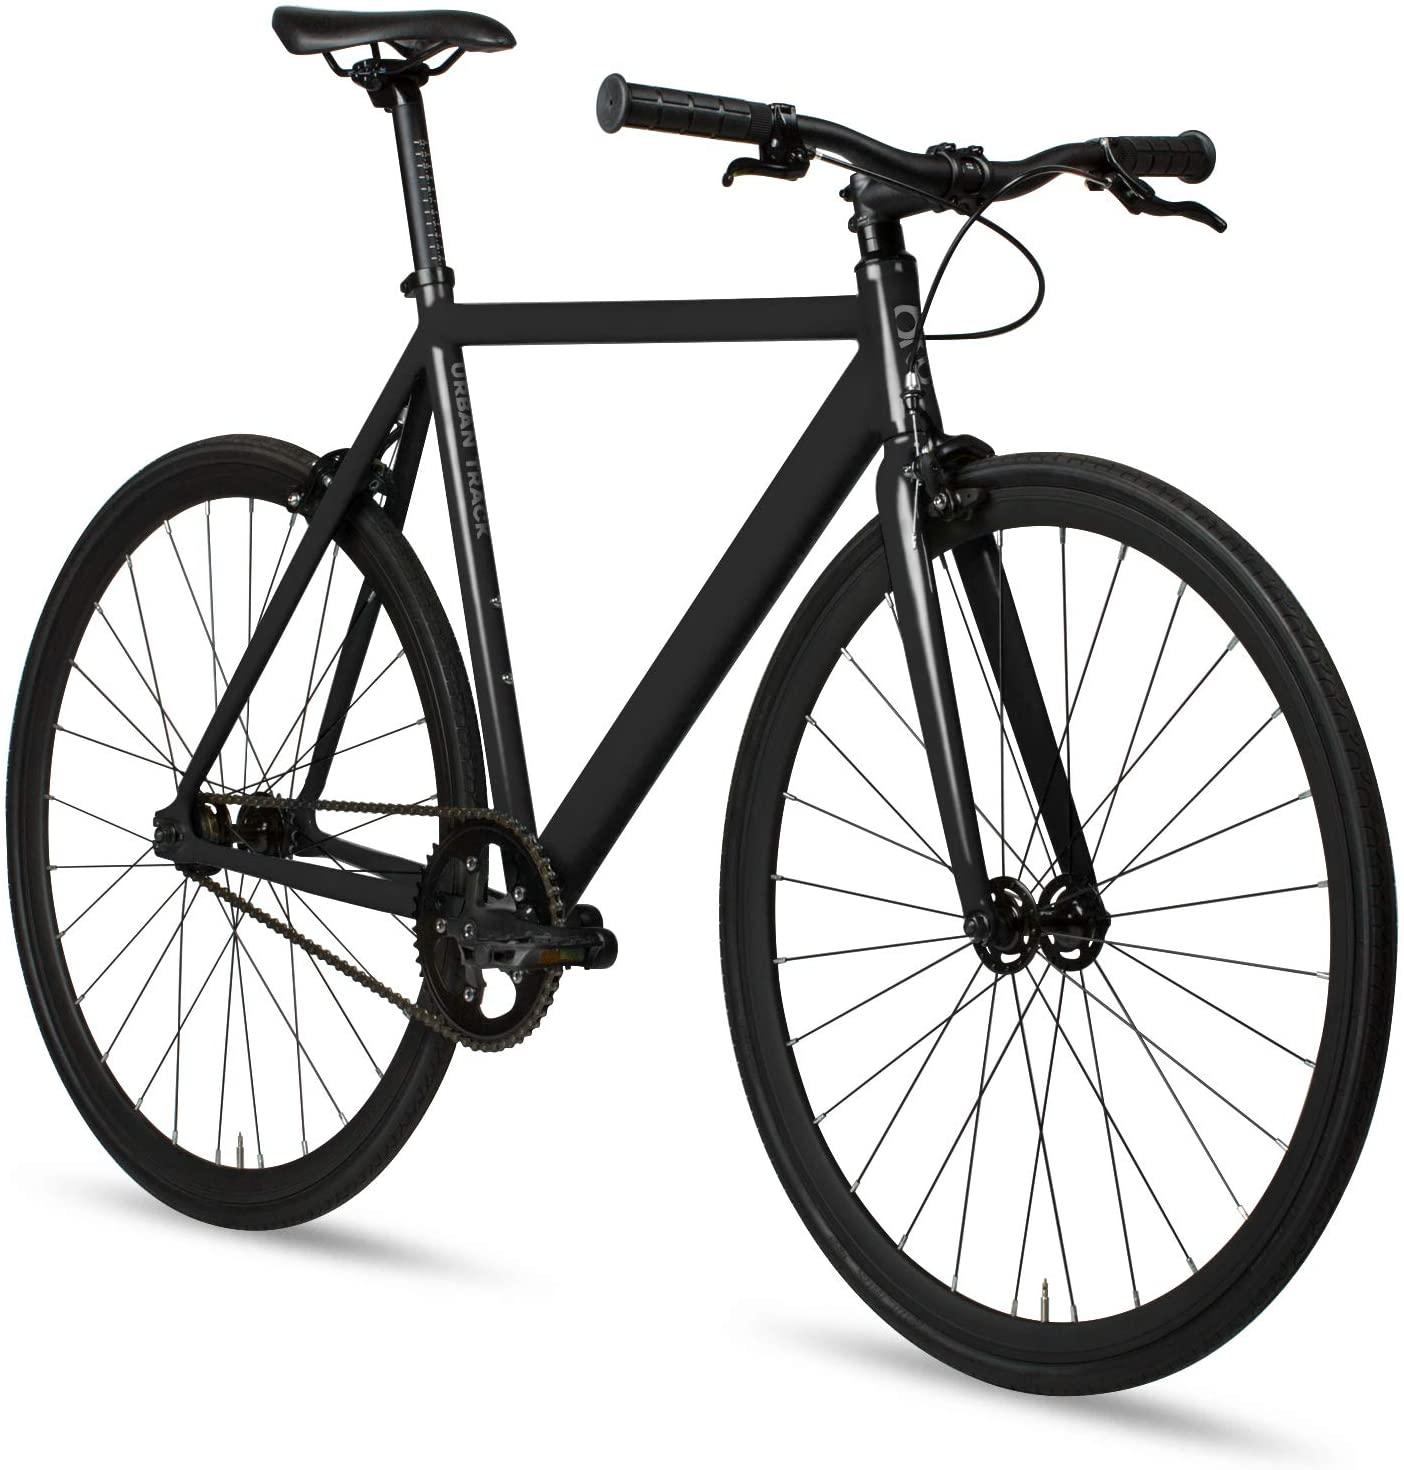 Bicicleta 6KU Urban track $950.000 (usada)